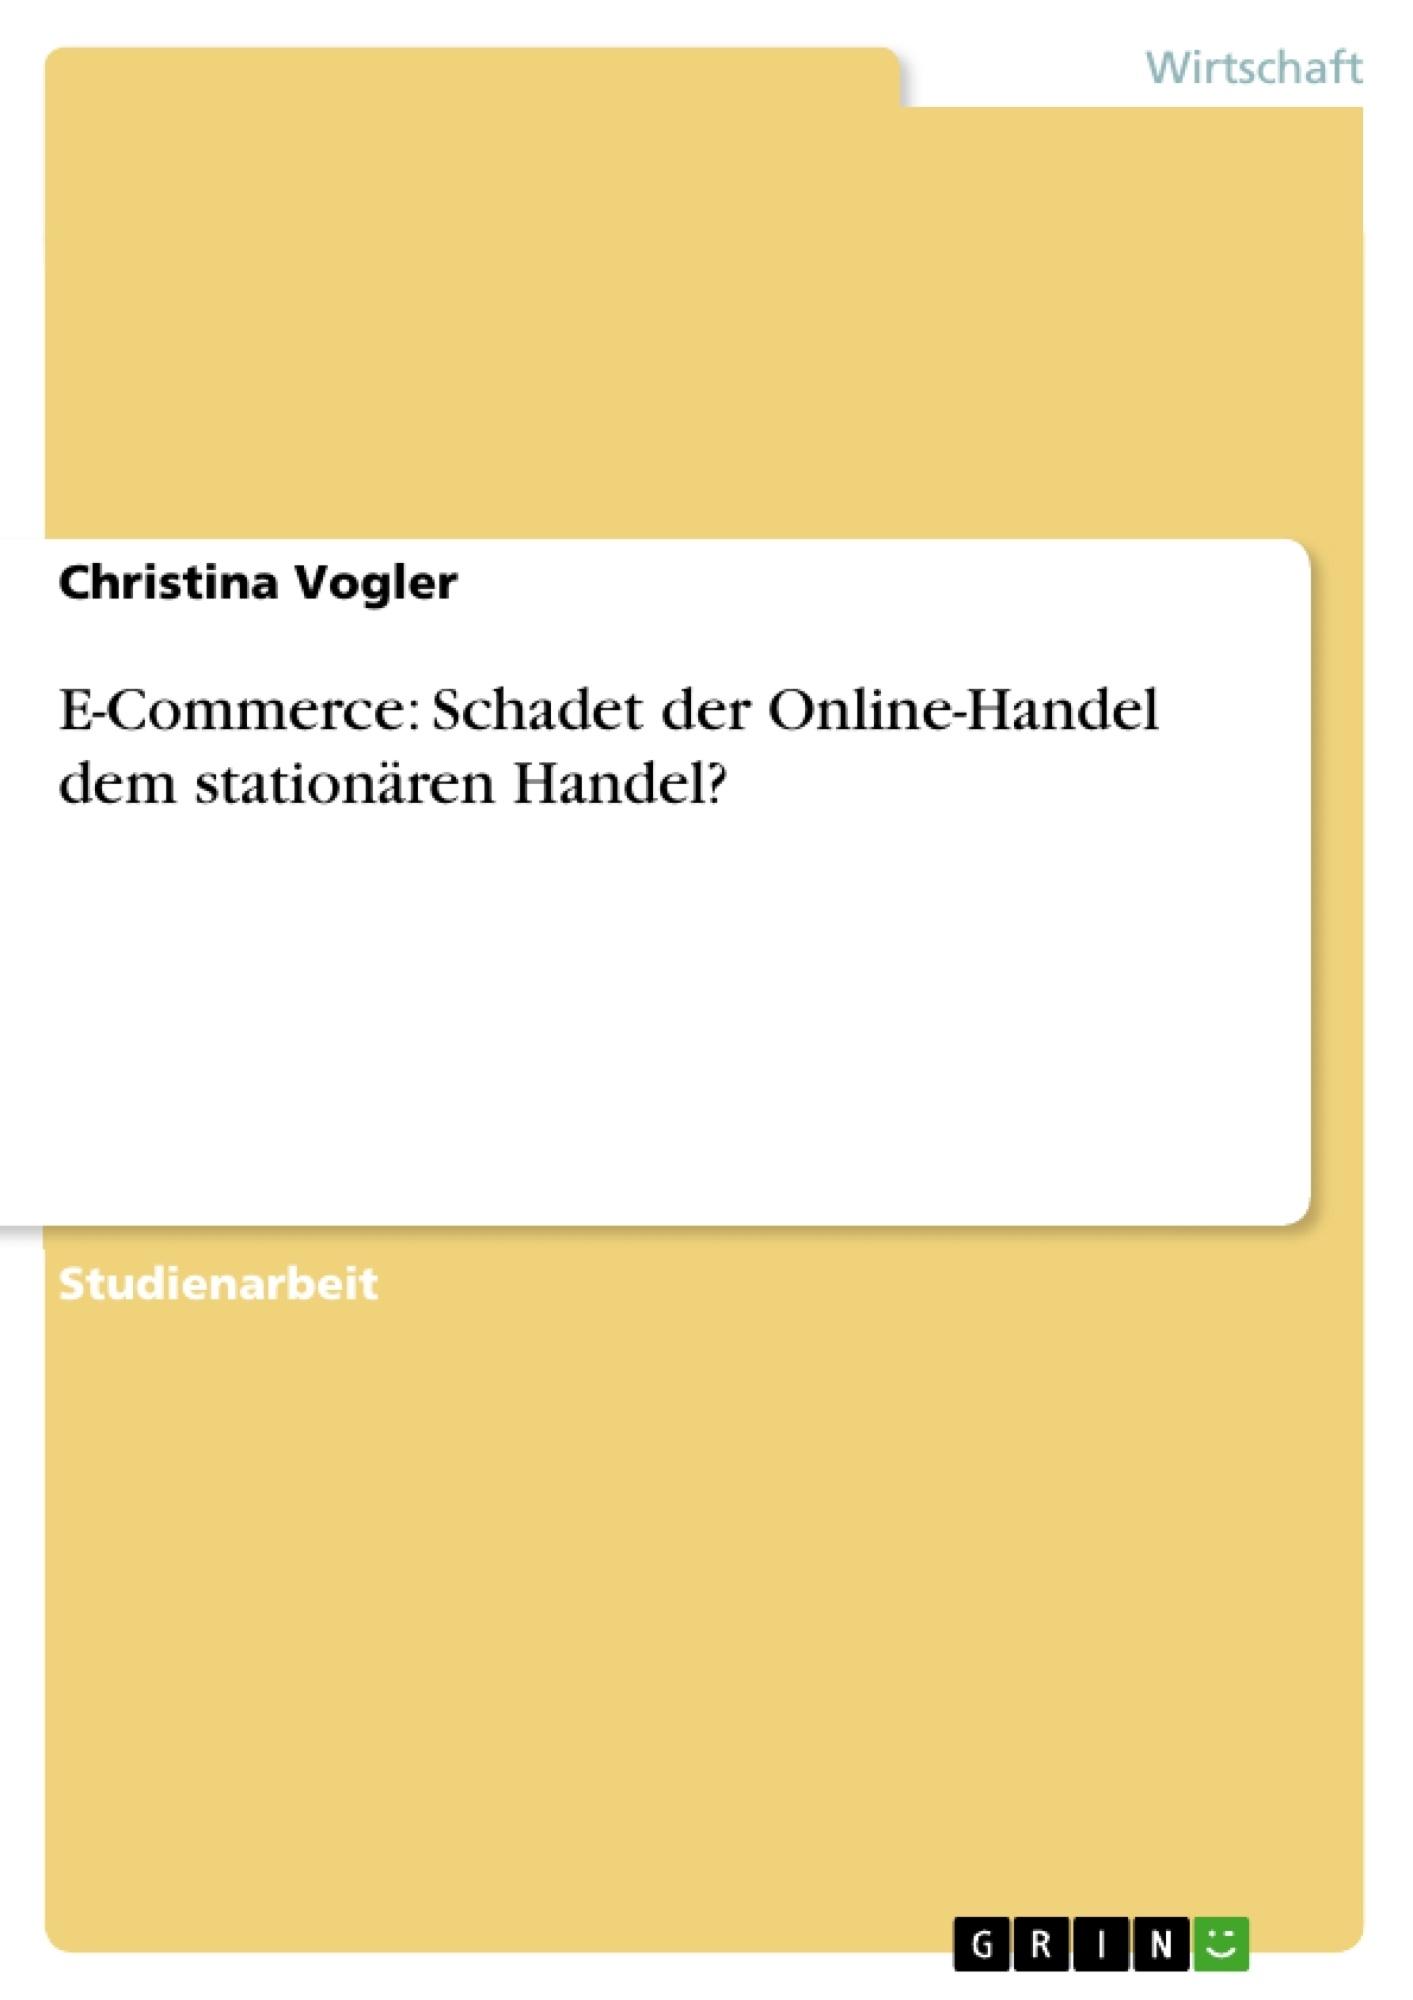 Titel: E-Commerce: Schadet der Online-Handel dem stationären Handel?